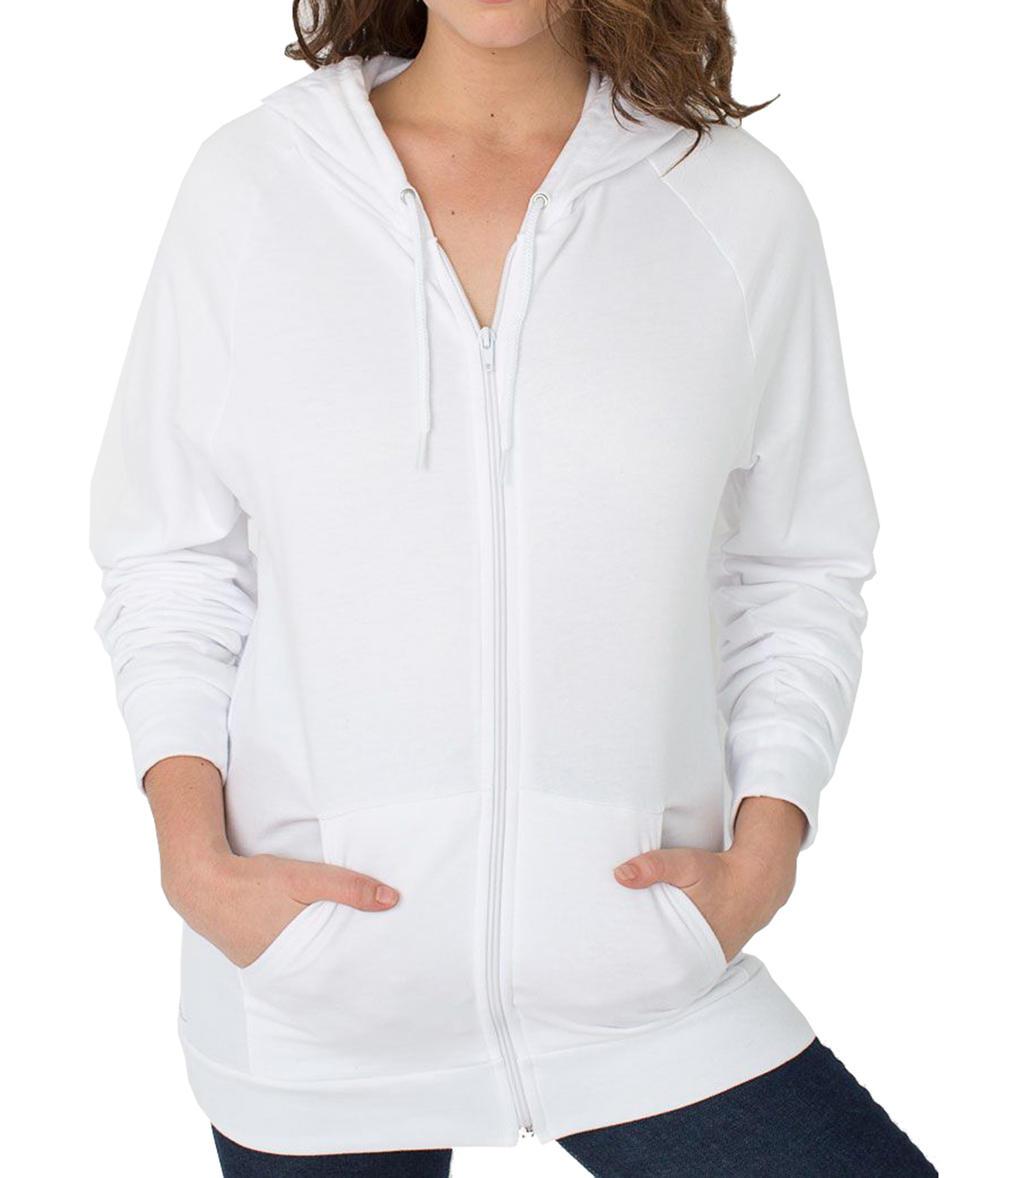 Unisex California Zip Hooded Sweat